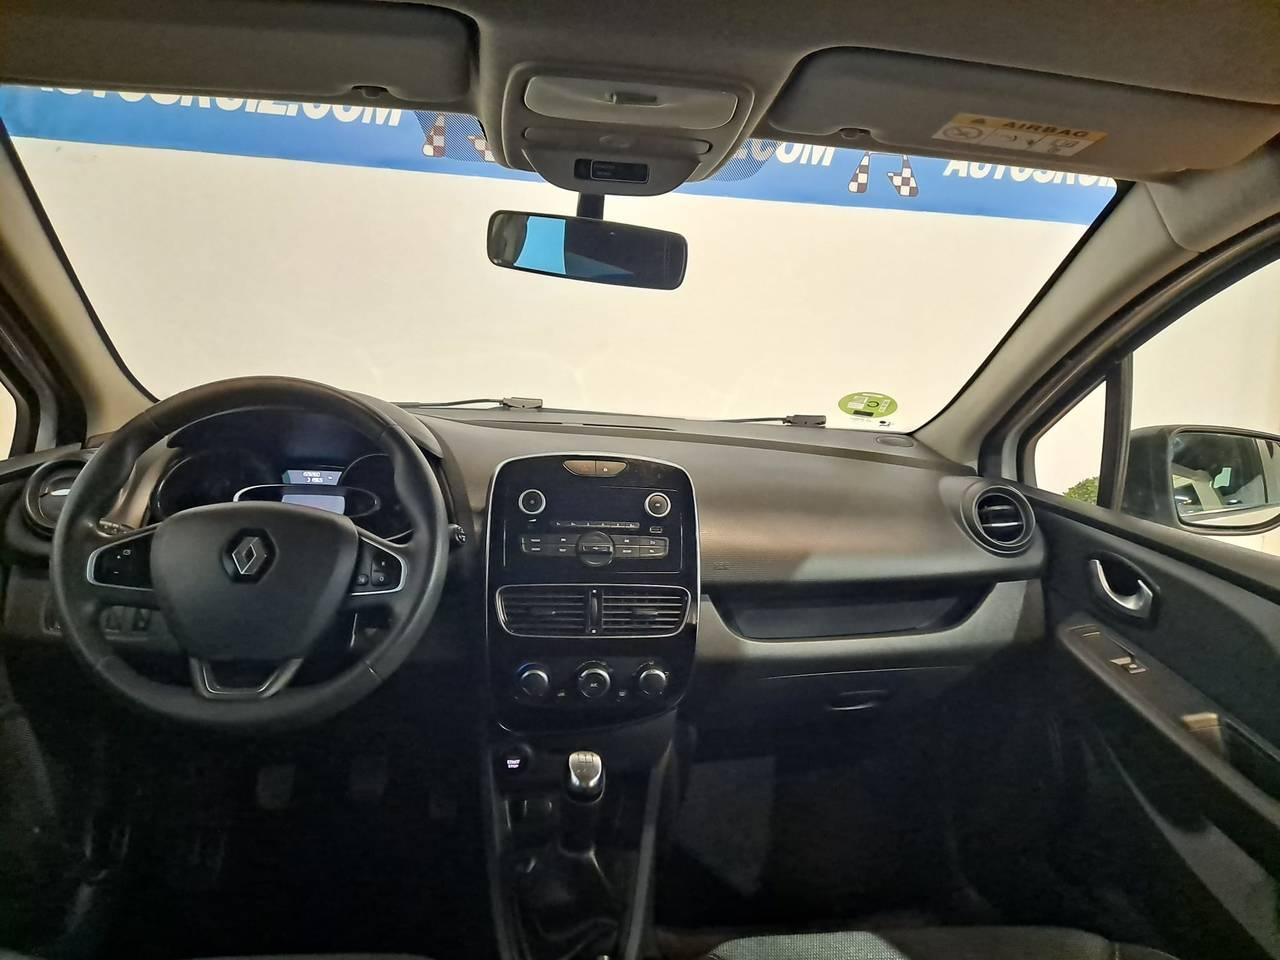 RENAULT CLIO SPORT TOURER 1.5 DCI  - Foto 12